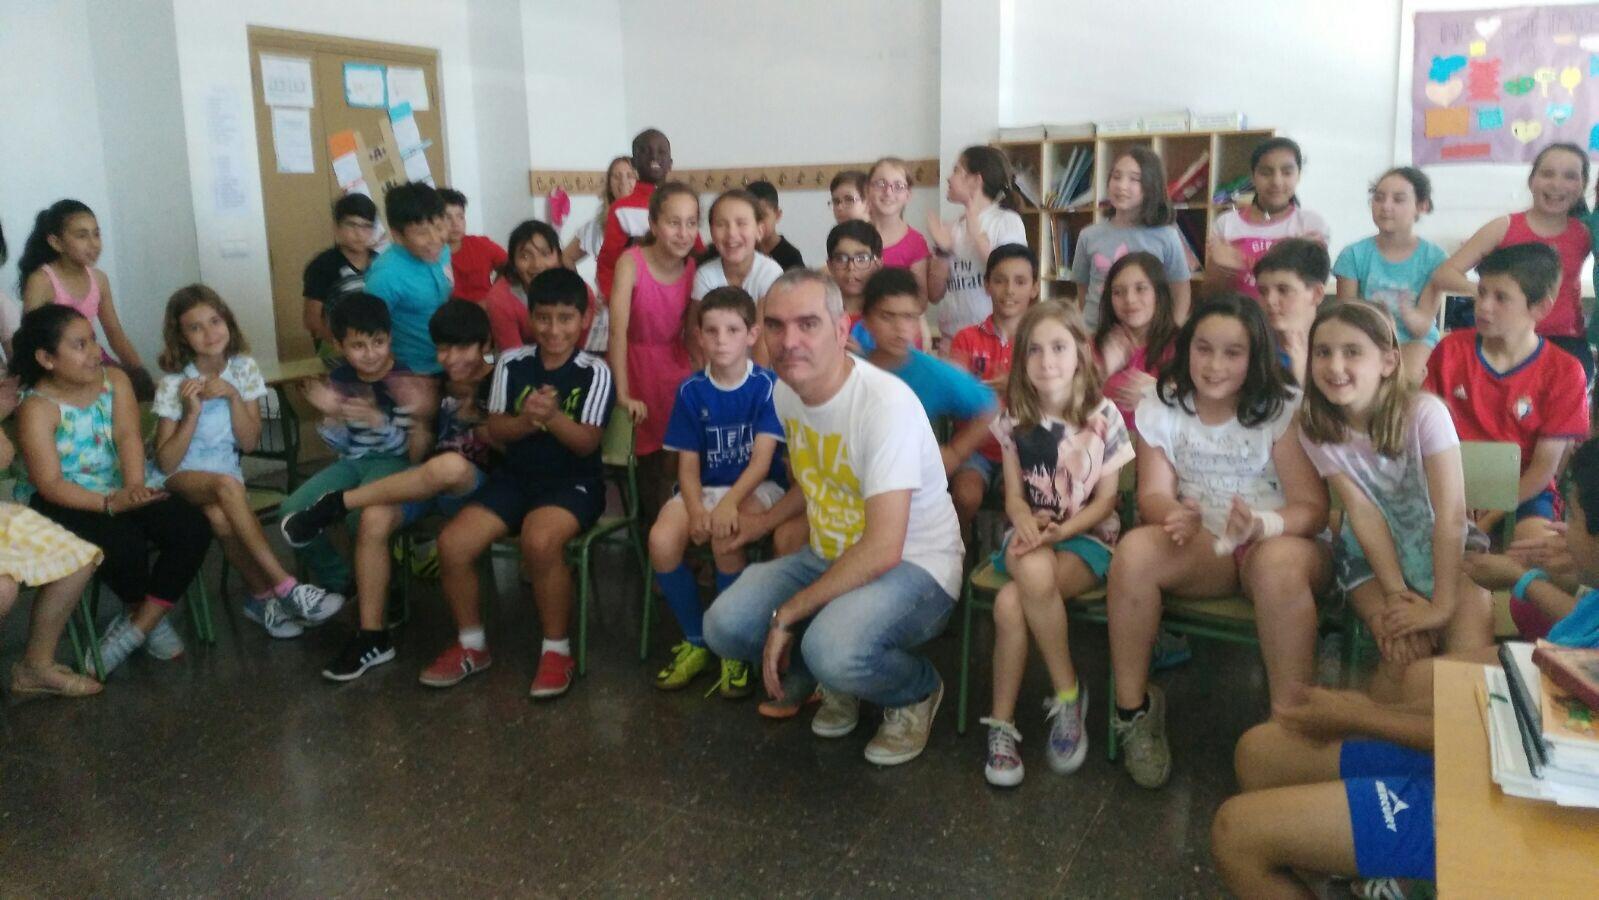 Colegio otero de navascues cintruenigo good routine song otero de navascues with colegio otero - Colegio otero de navascues ...